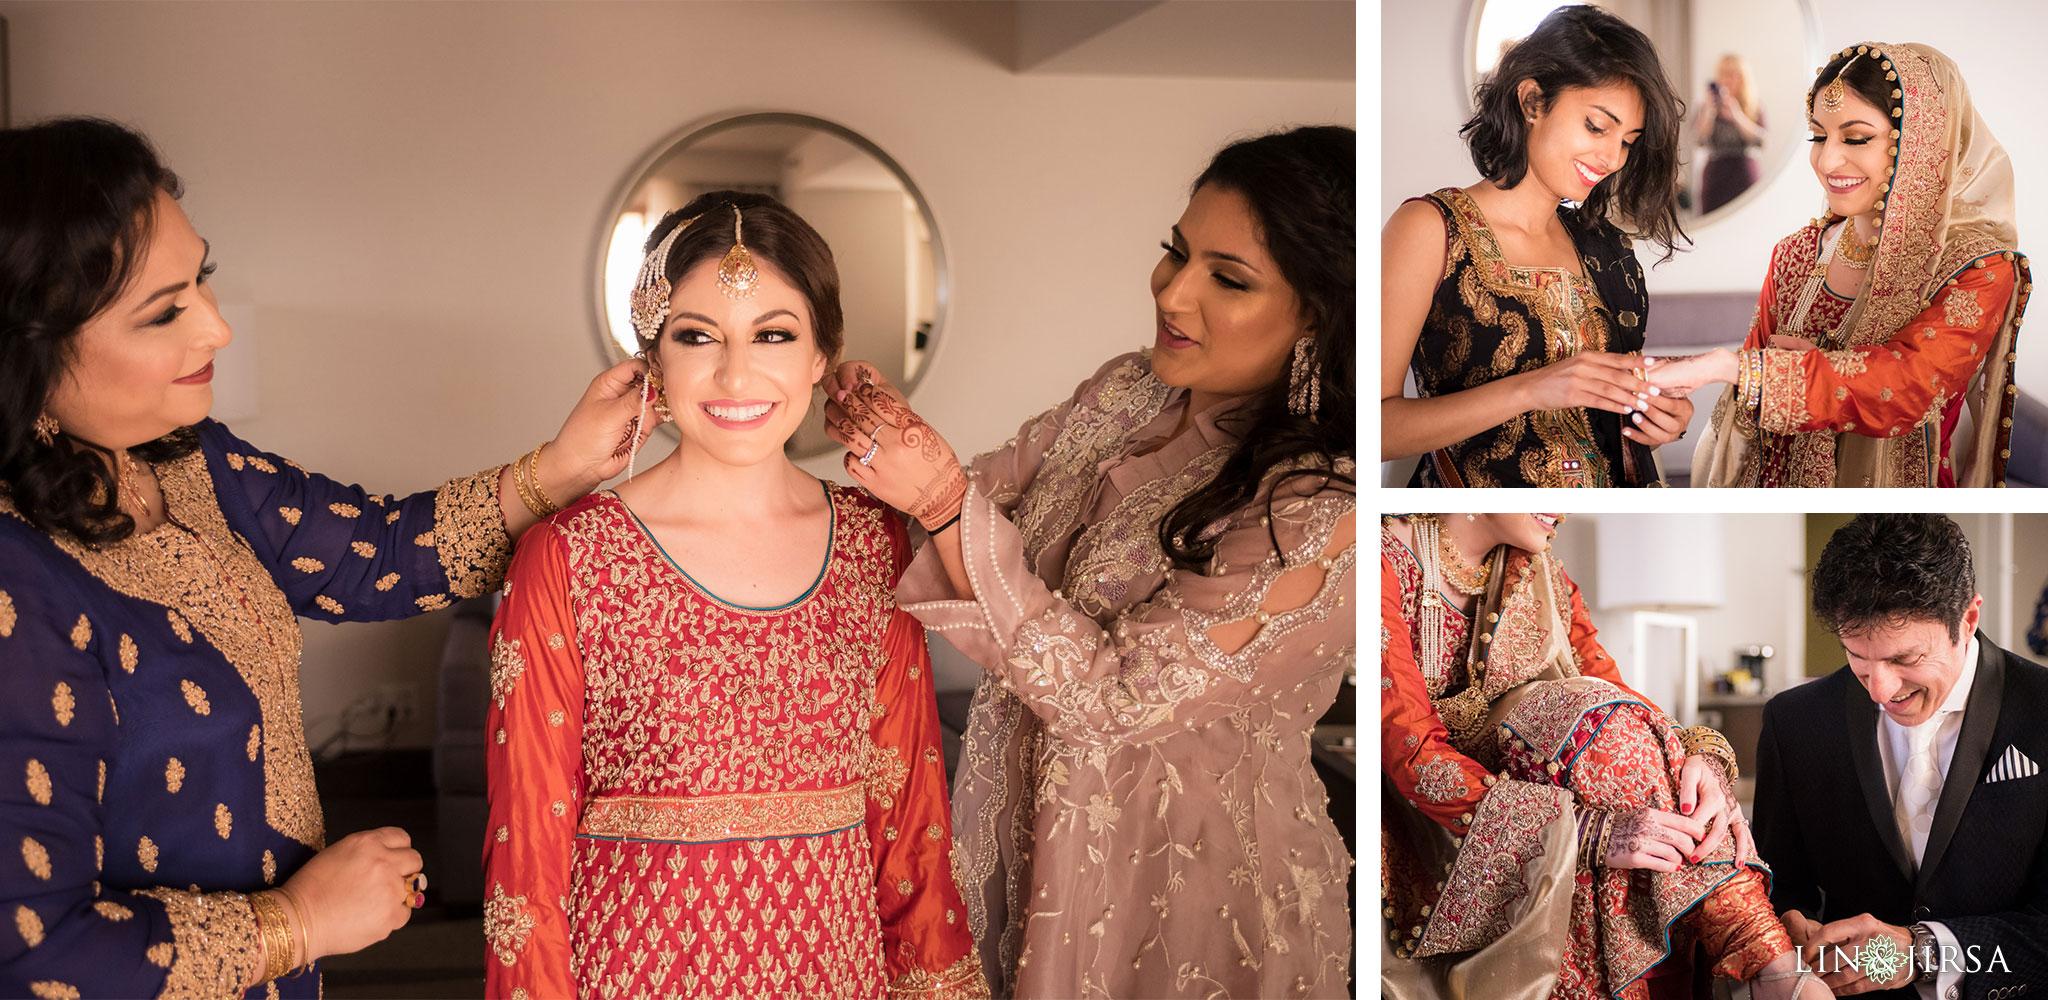 02 hilton long beach pakistani persian muslim bride wedding photography